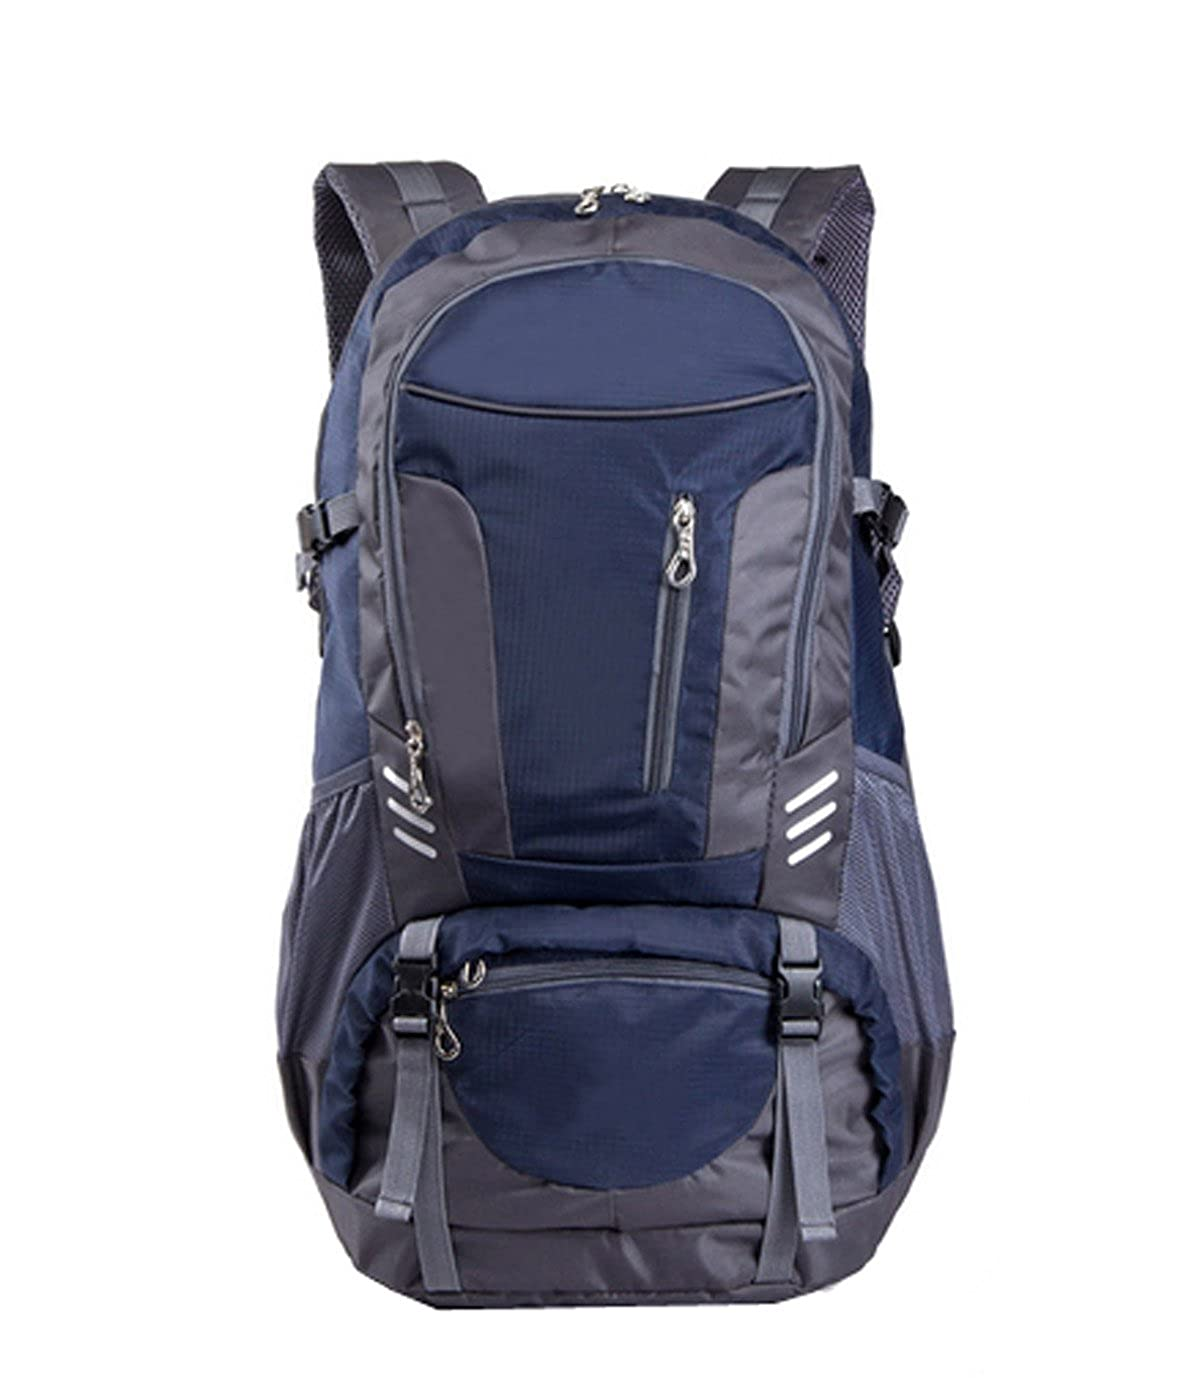 4 One Size LAIDAYE Large Capacity Bag Shoulder Bag Travel Bag Outdoor Bag Multifunctional Package Backpack